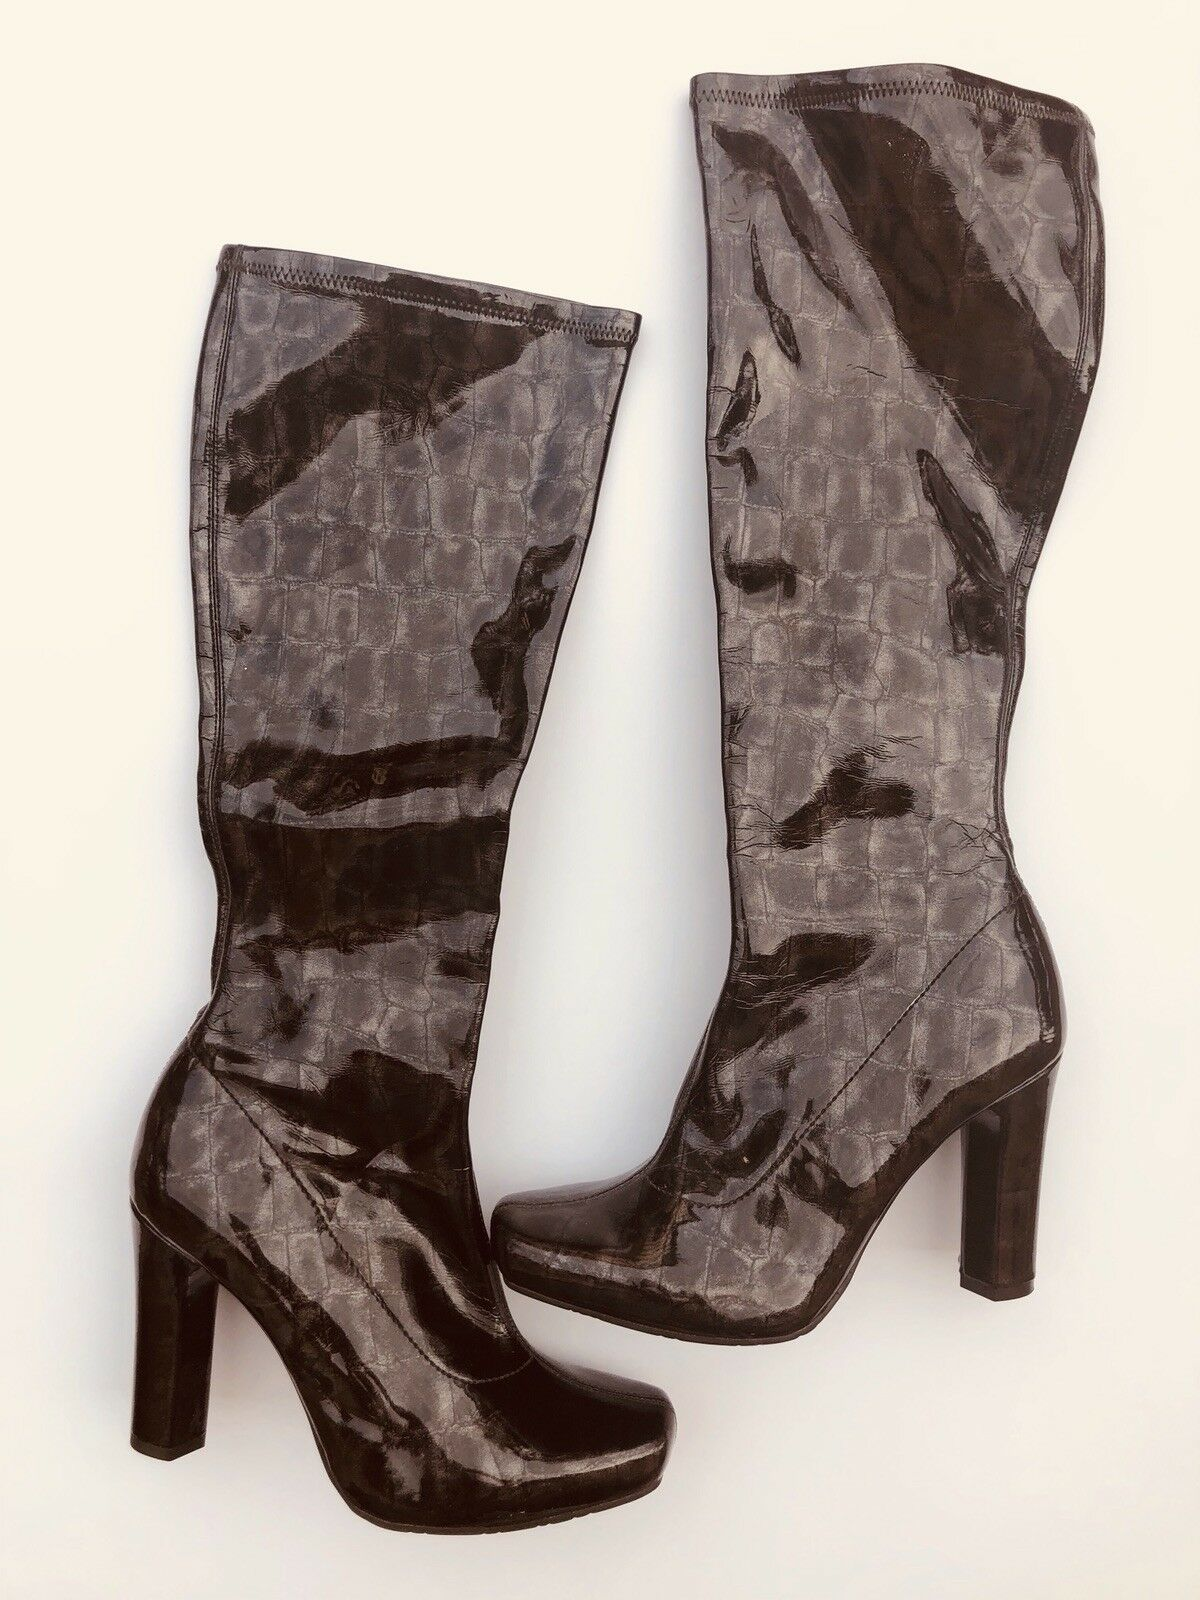 BCBGirls Women's Shiny shoes Brown high heels boots shoes Shiny 8 M New c986c5